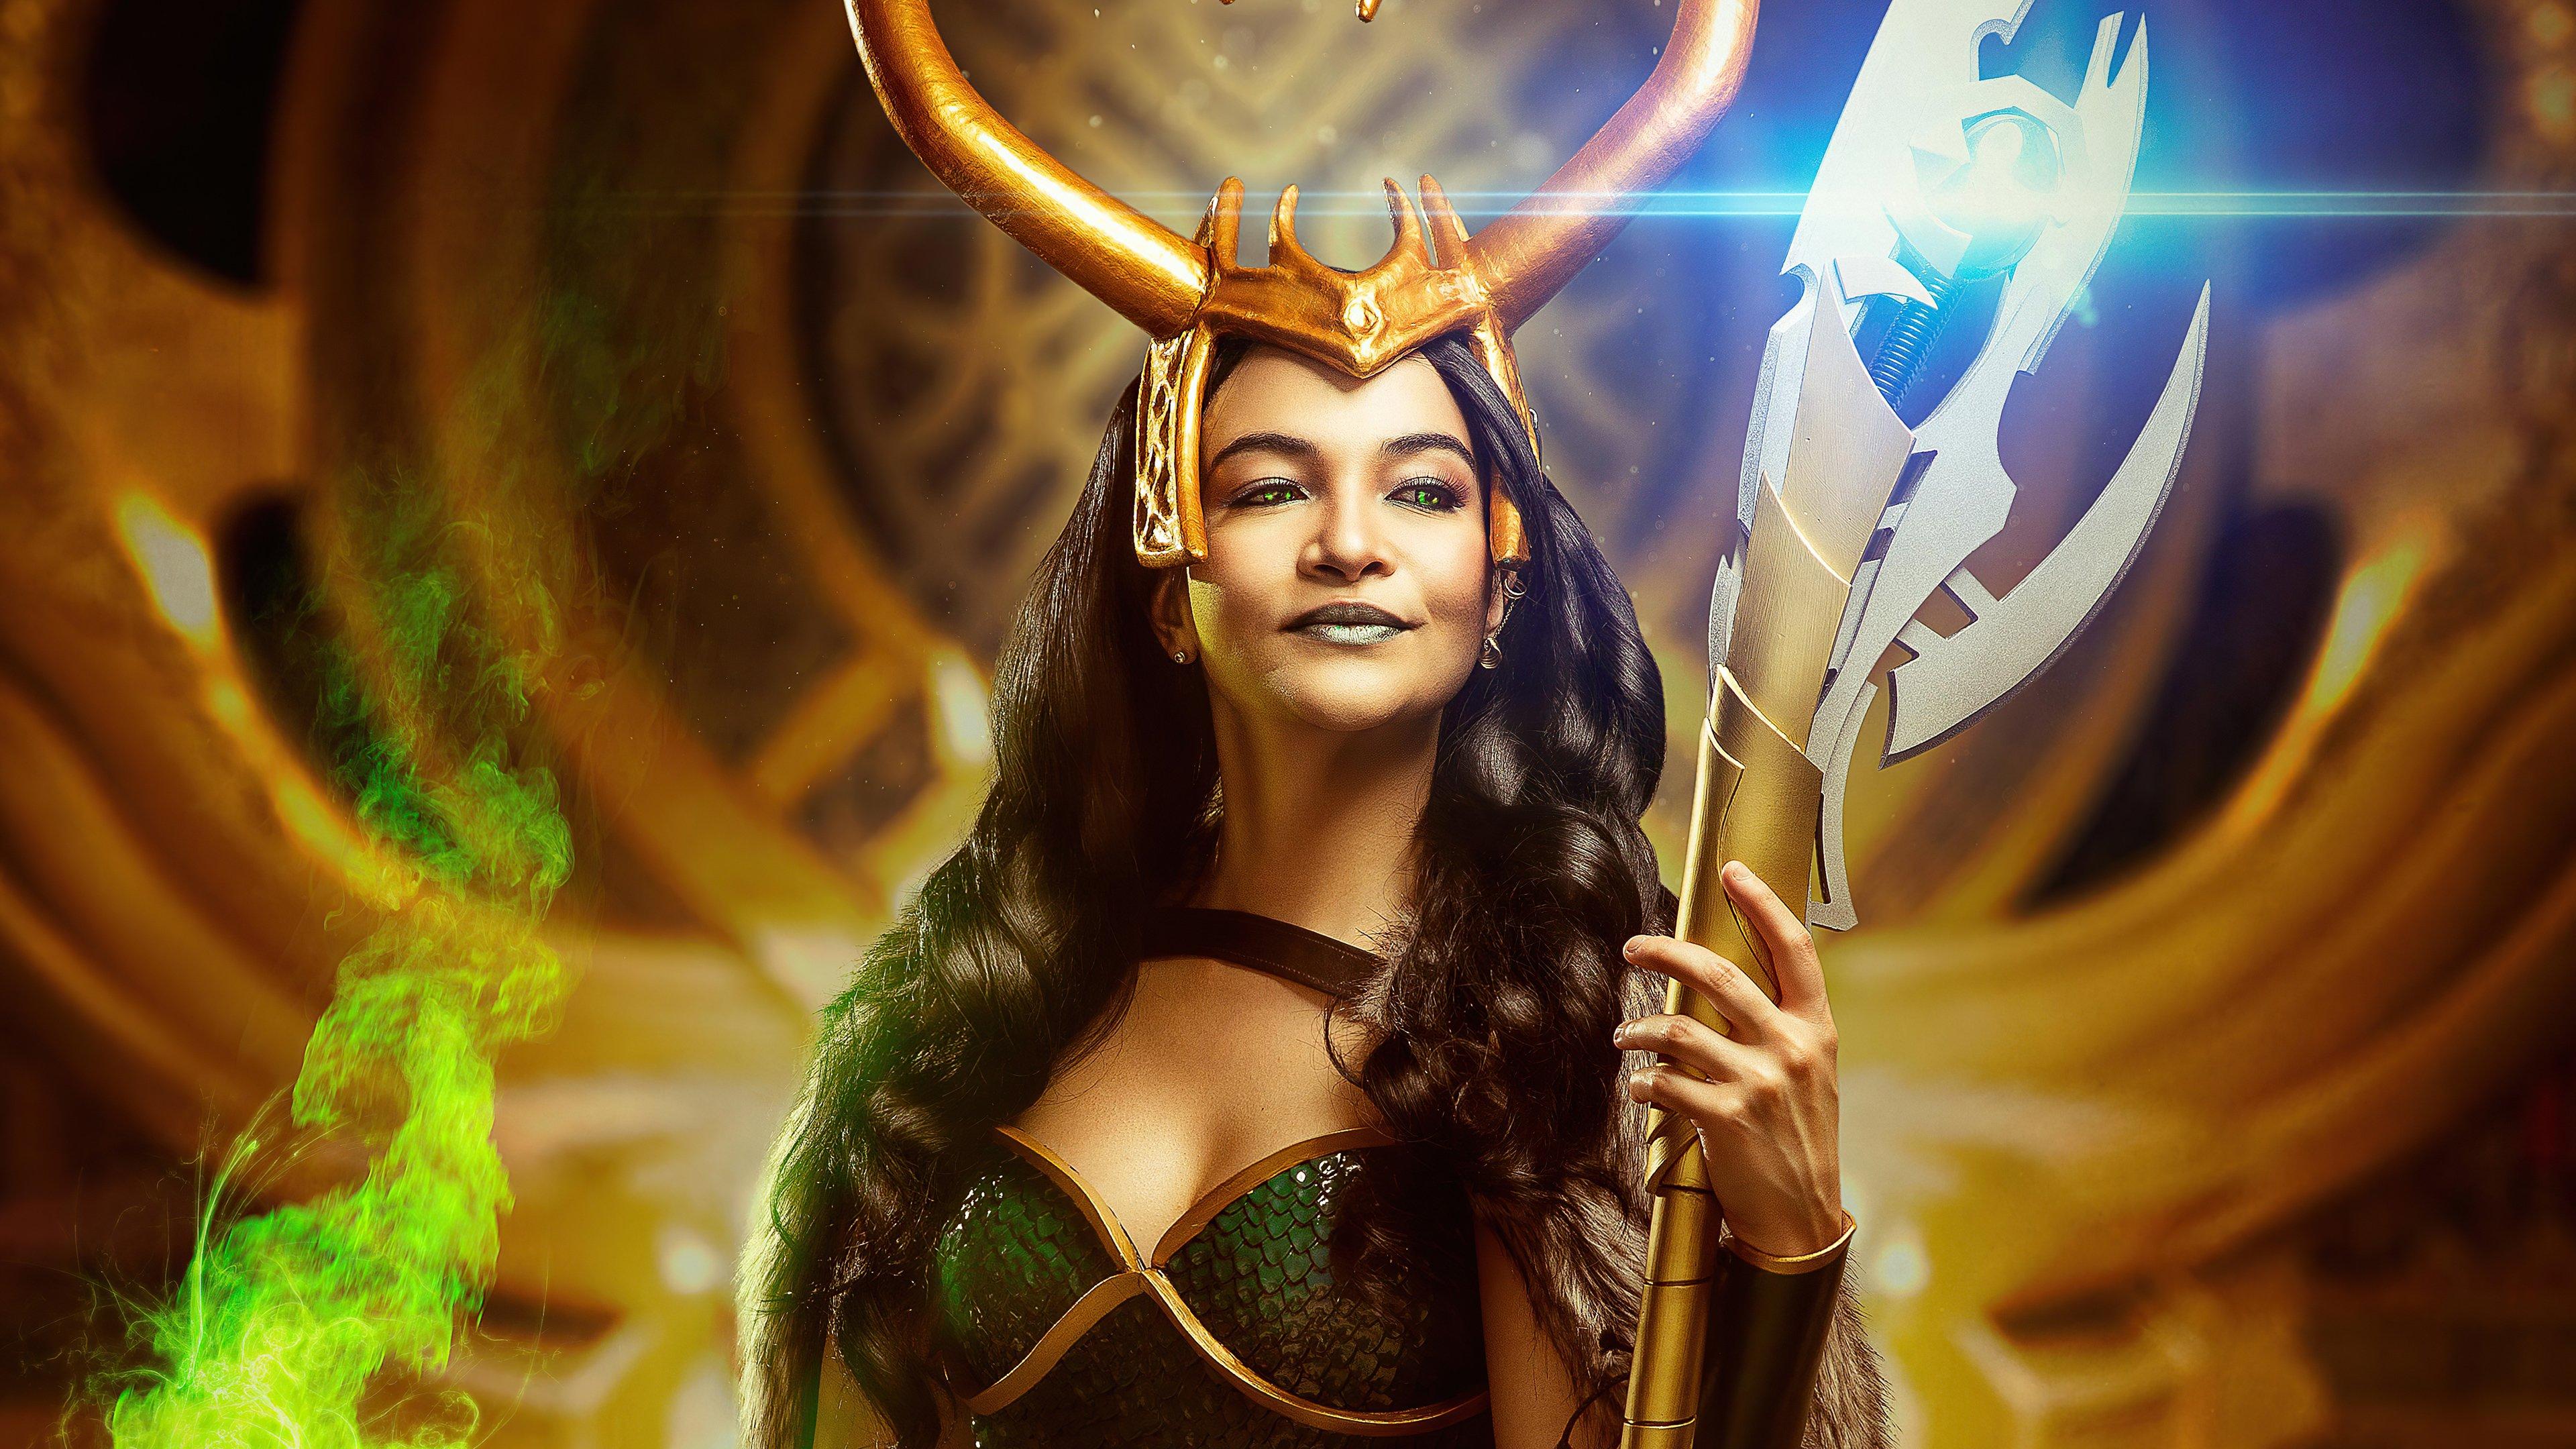 Wallpaper Lady Loki Cosplay